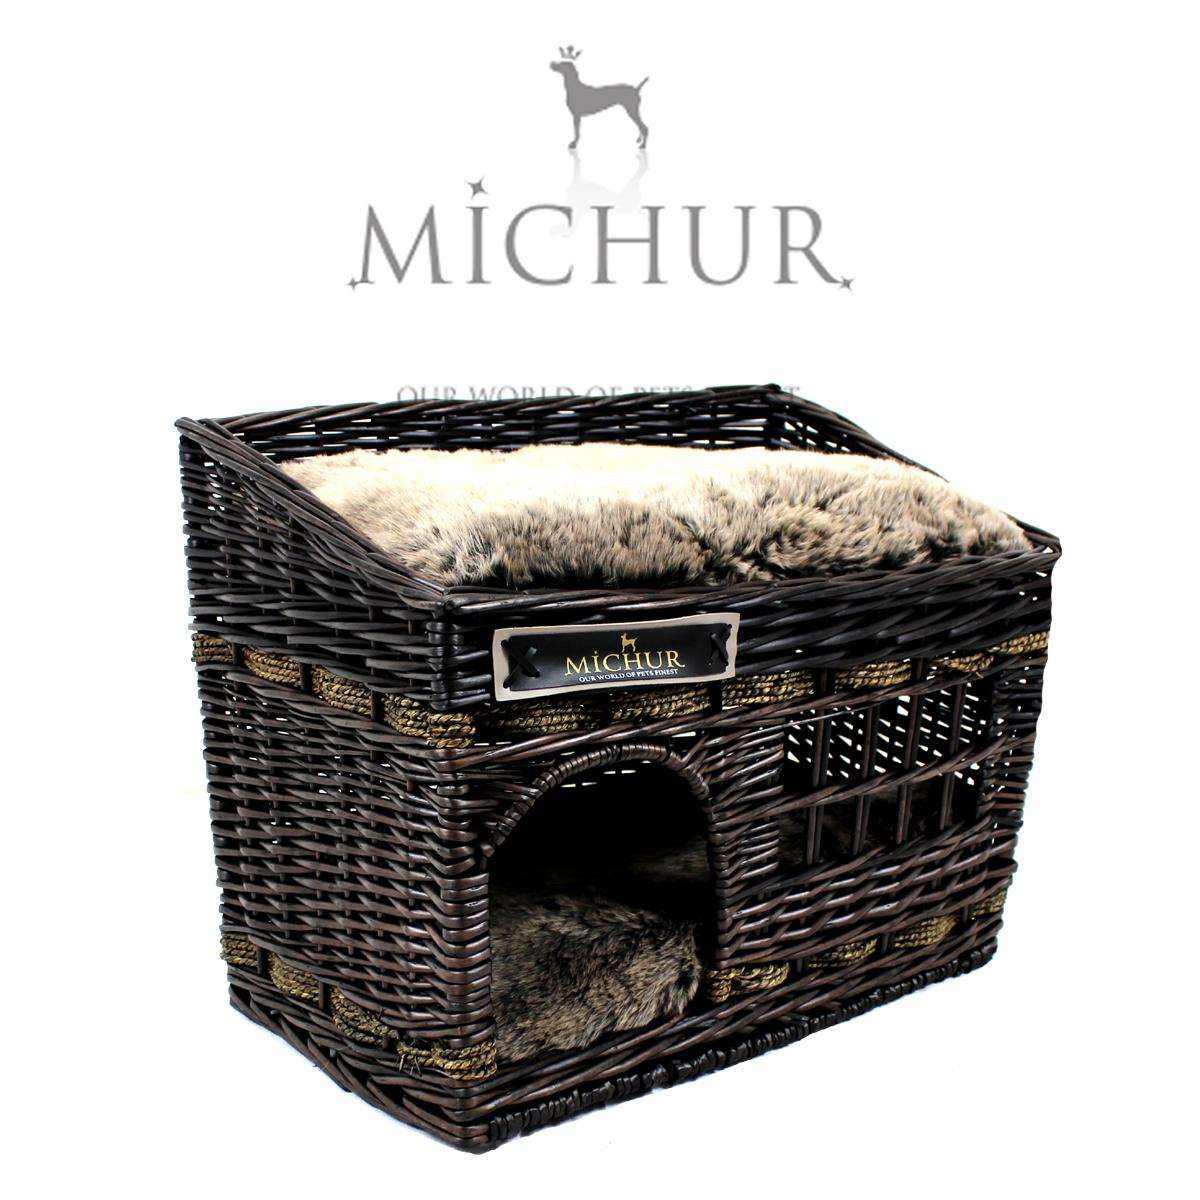 Handmade Wicker Dog Basket : Michur jerry dog cat basket bed cave rattan willow